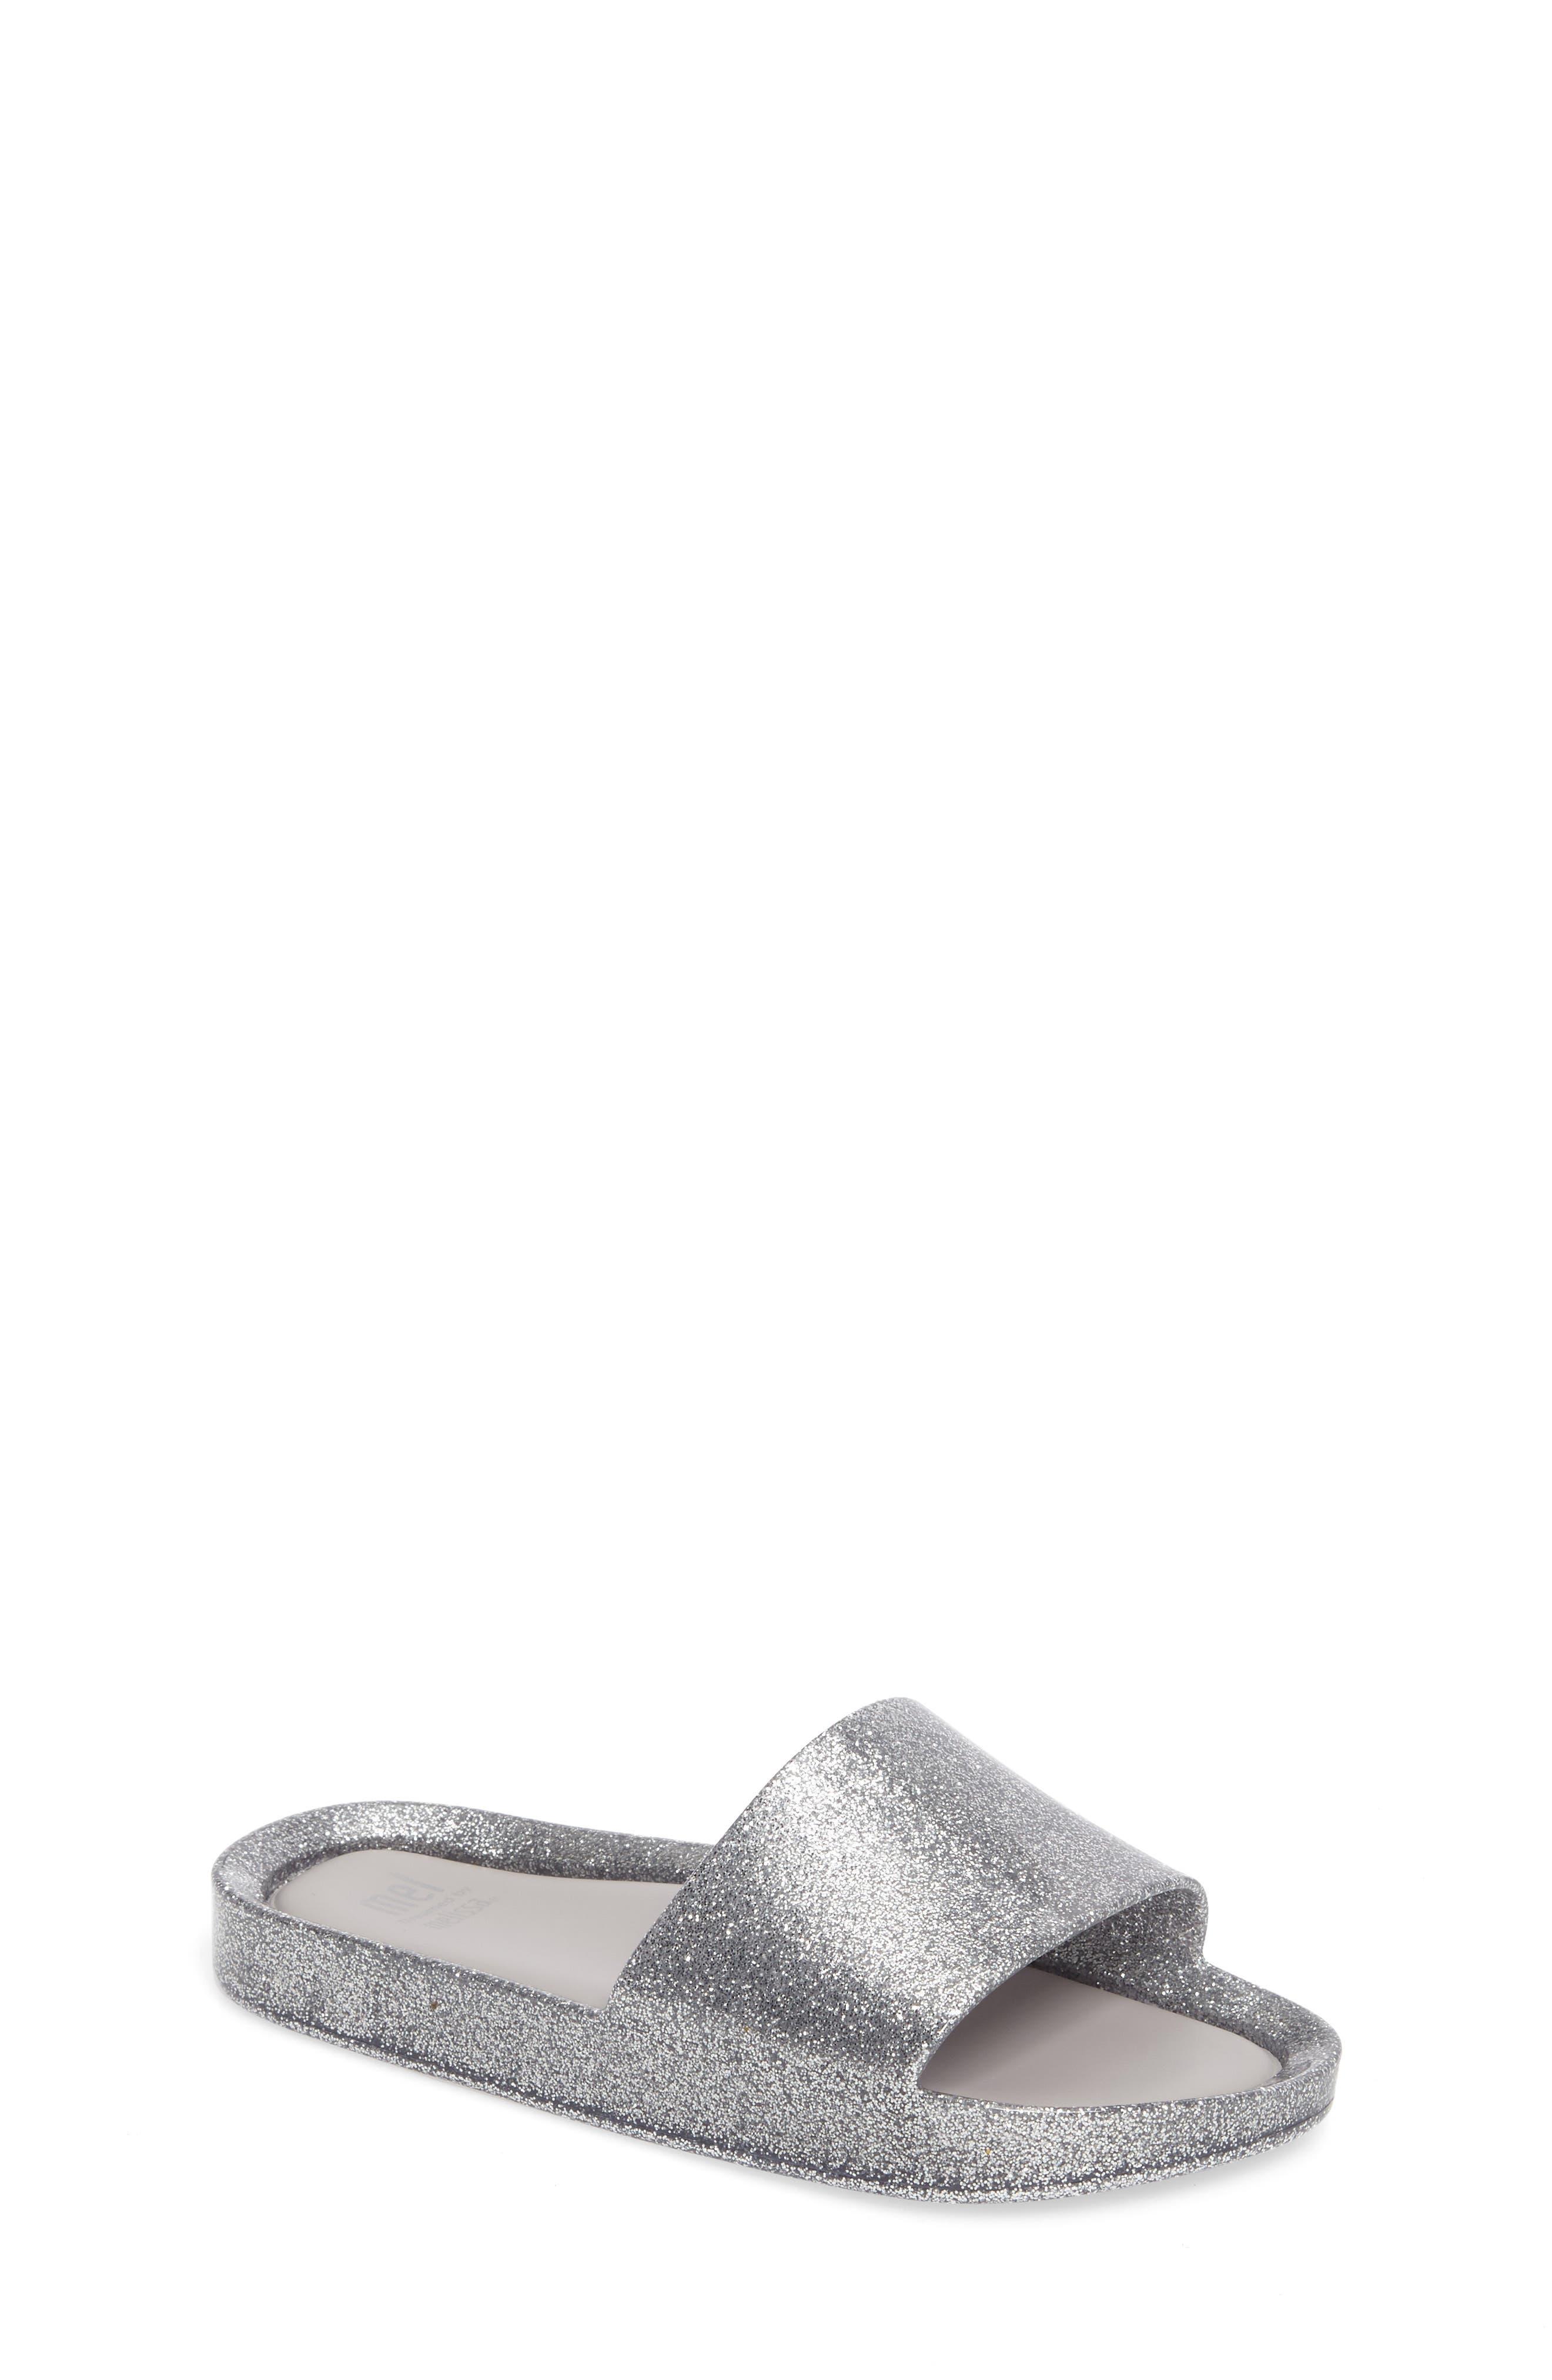 Beach Slide,                         Main,                         color, Silver Glass Glitter